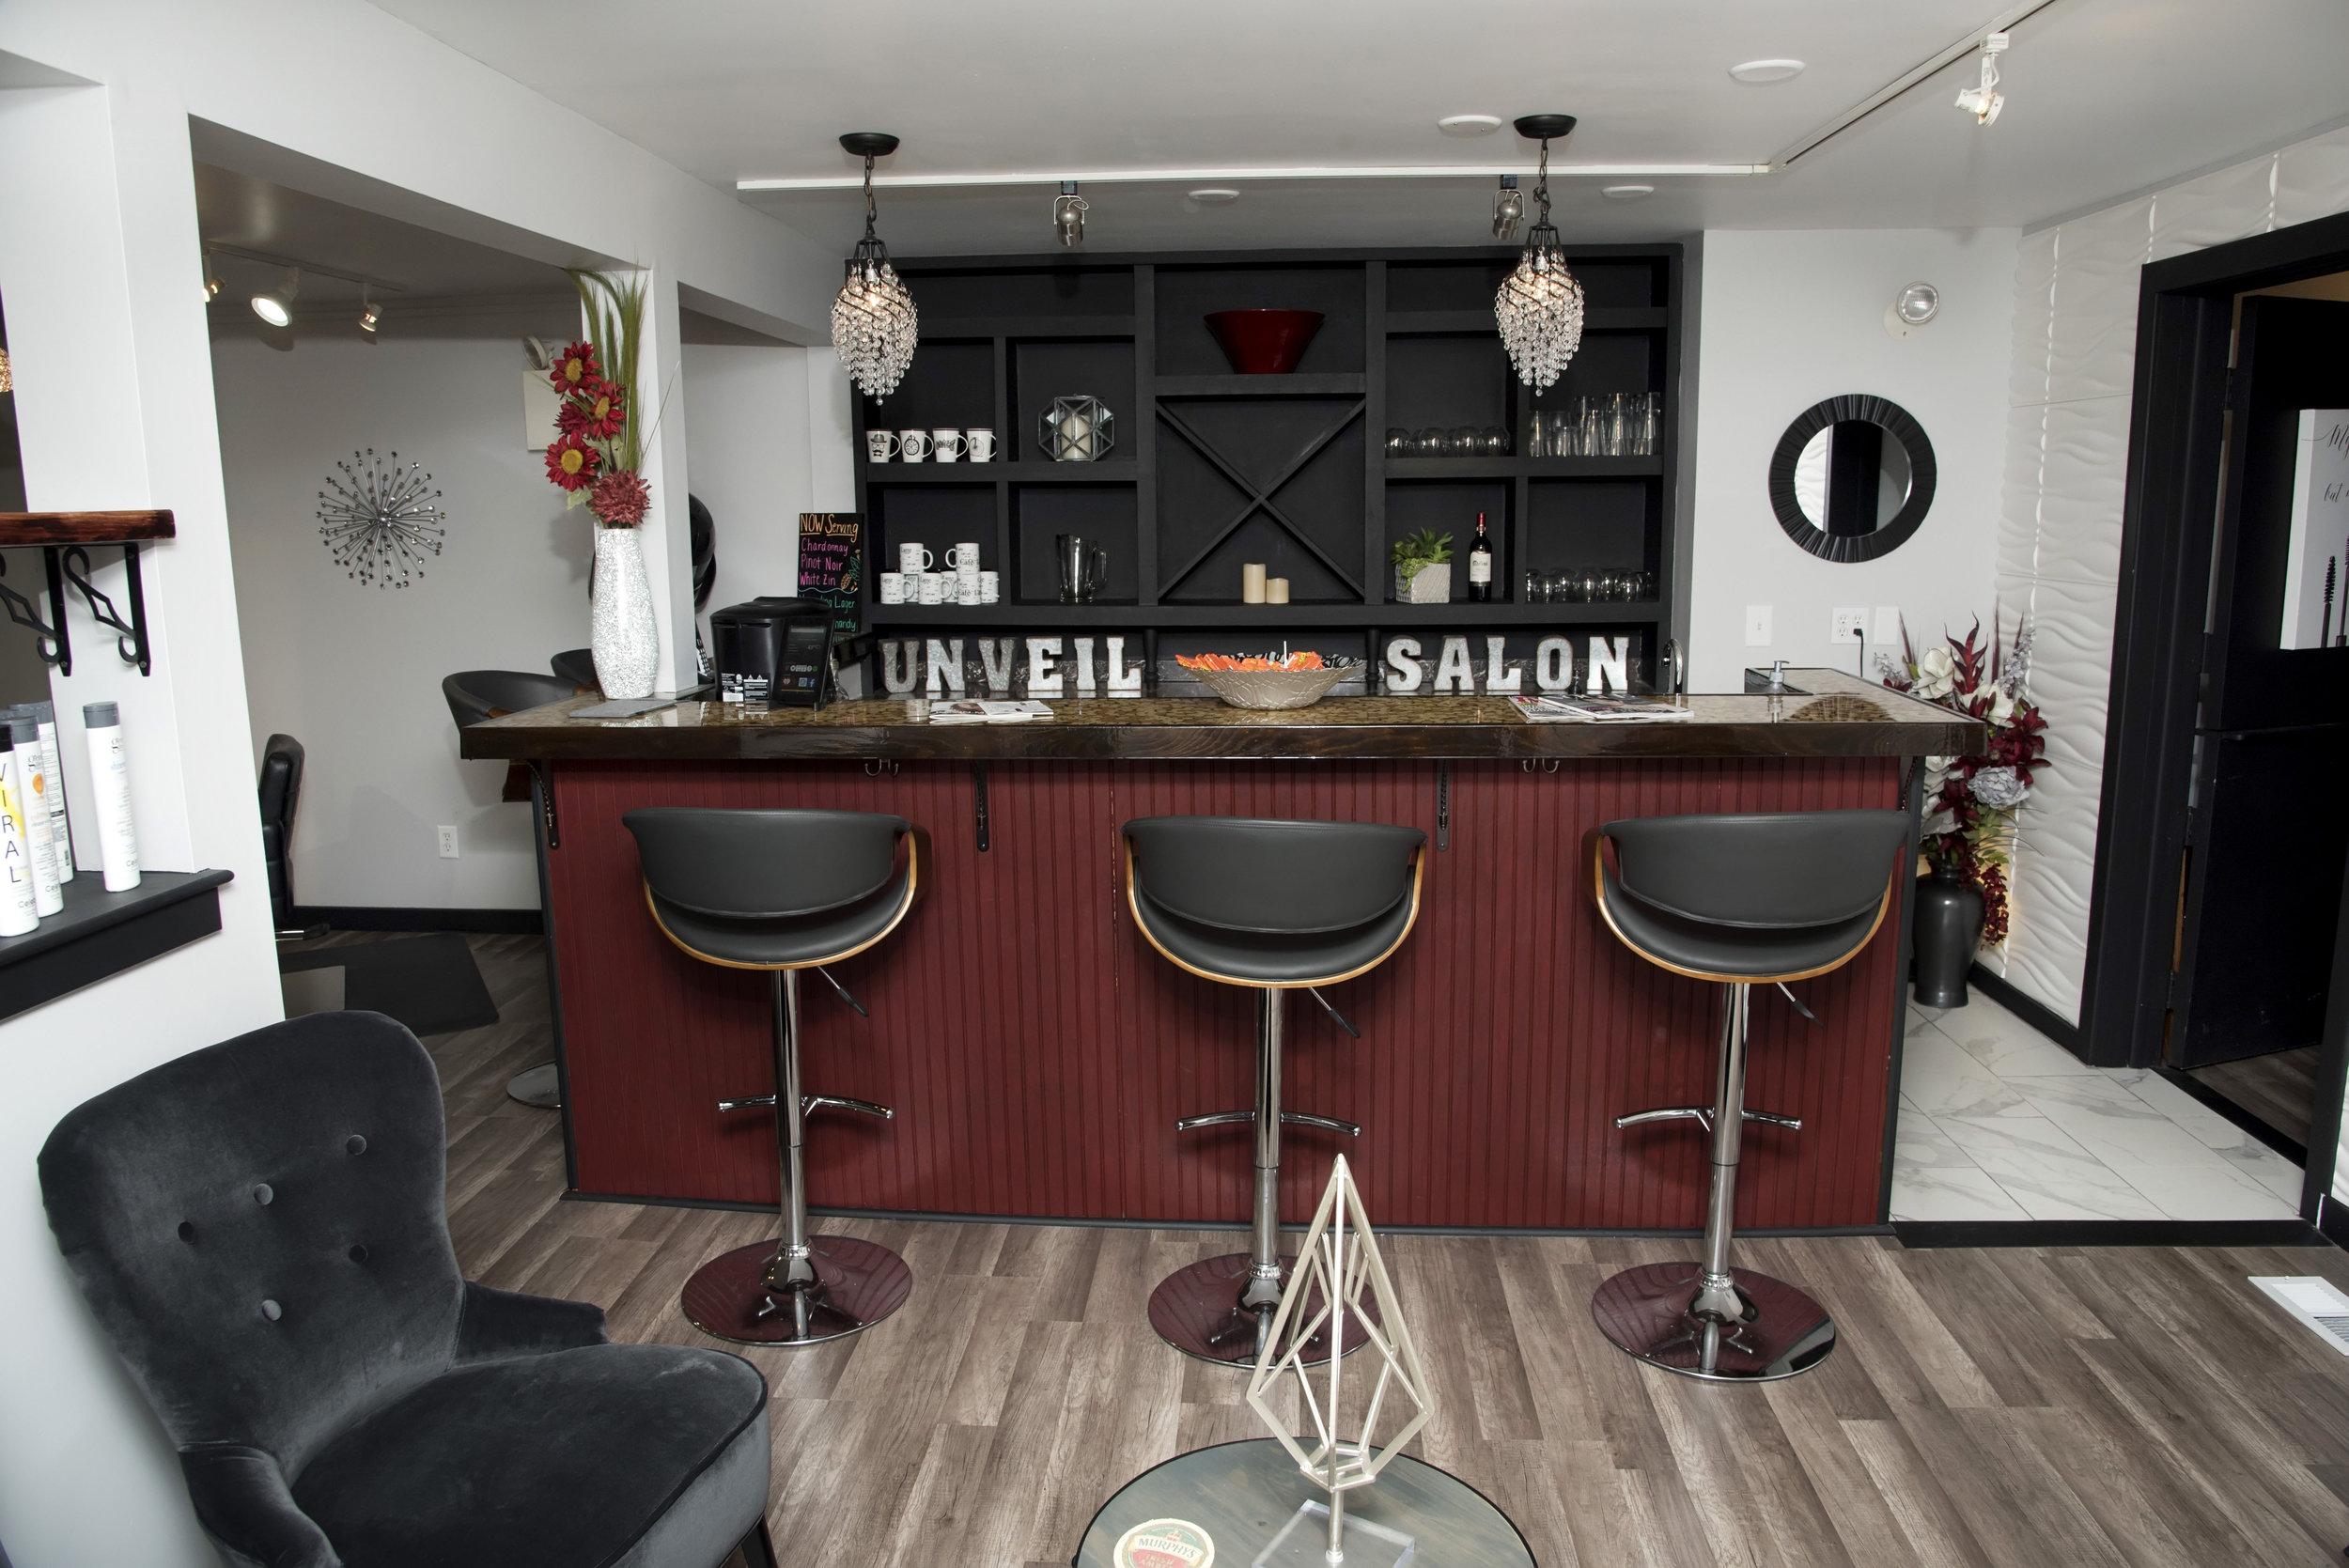 Unveil Salon 2018_033.jpg